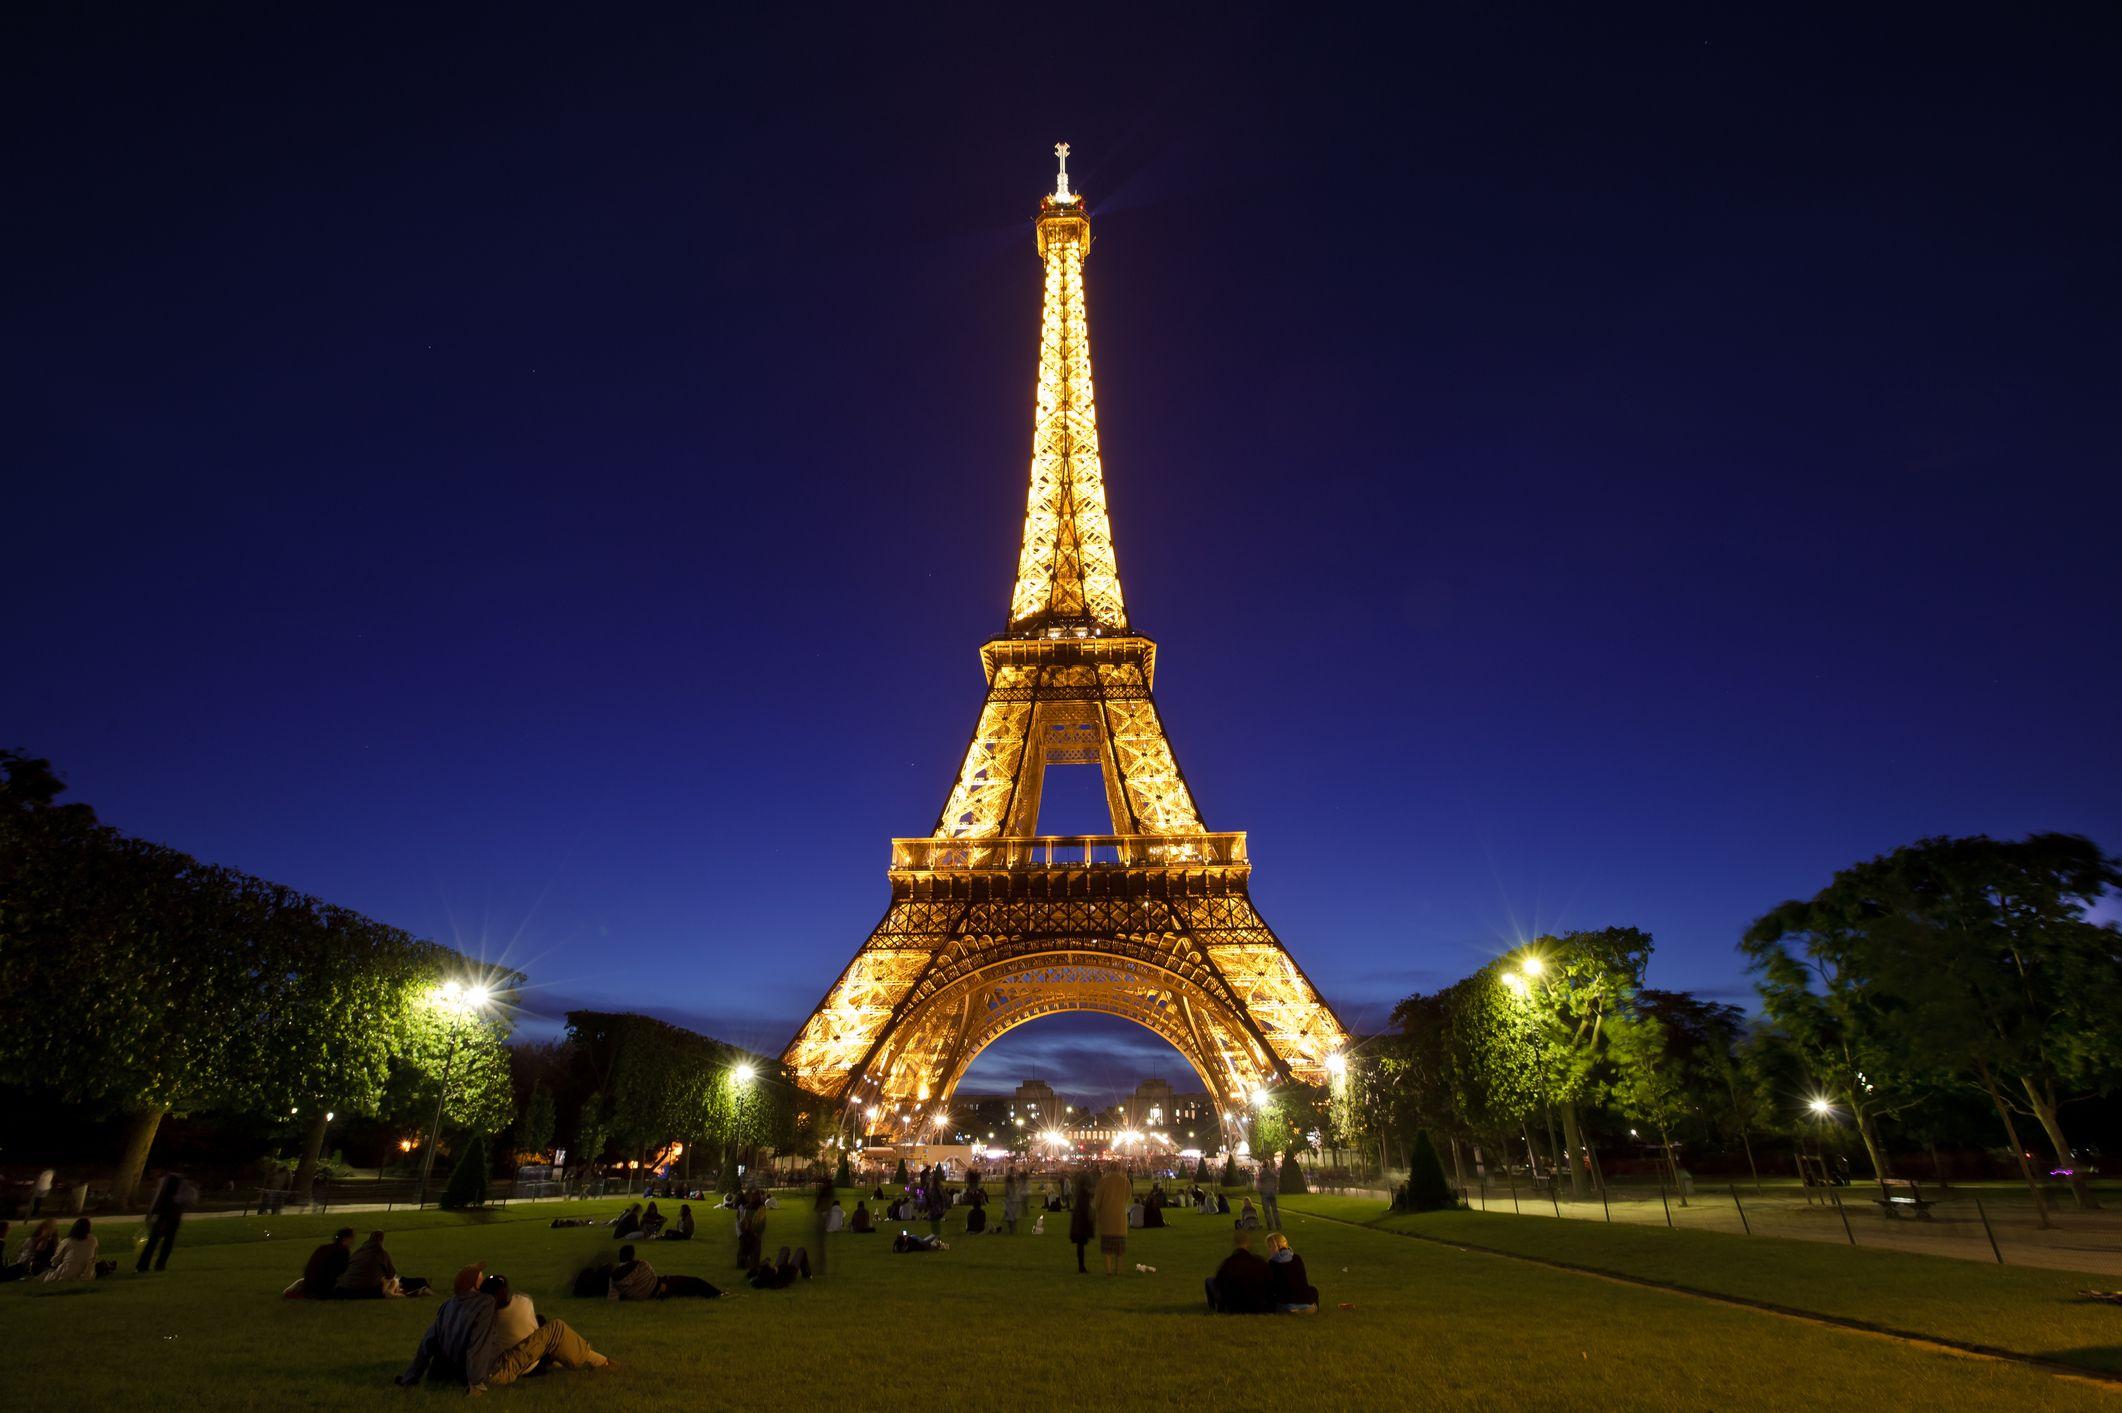 Eiffel tower hd wallpapers download free eiffel tower tumblr eiffel tower hd wallpapers download free eiffel tower tumblr pinterest hd wallpapers voltagebd Gallery